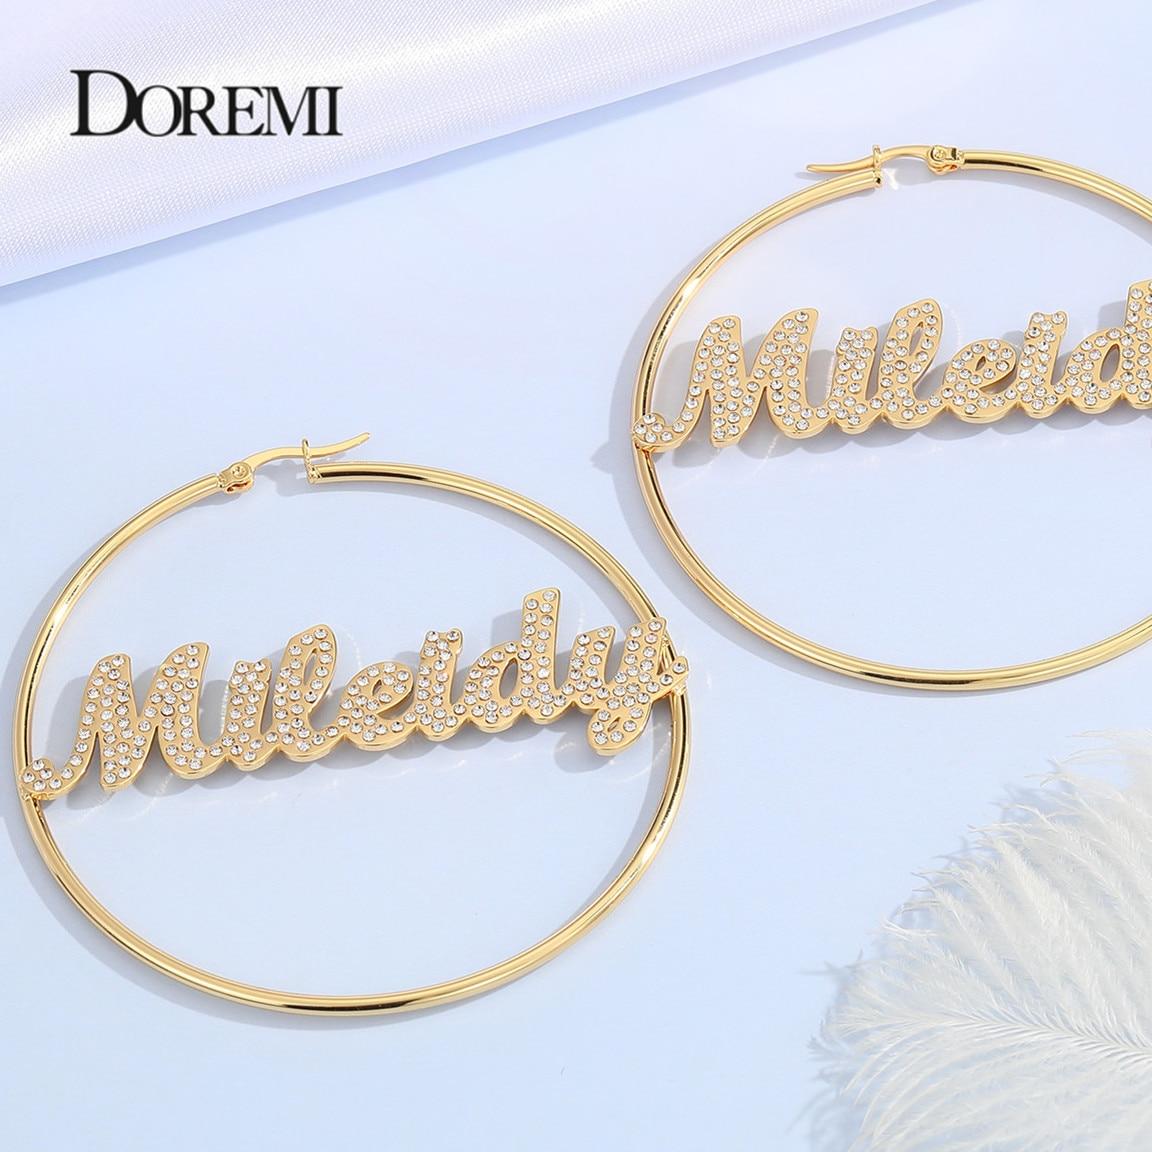 DOREMI Stainless Bling Name Bamboo Earrings Custom Hoop Bamboo Names Earrings Letter Big Personalised Name Earrings Women Gift